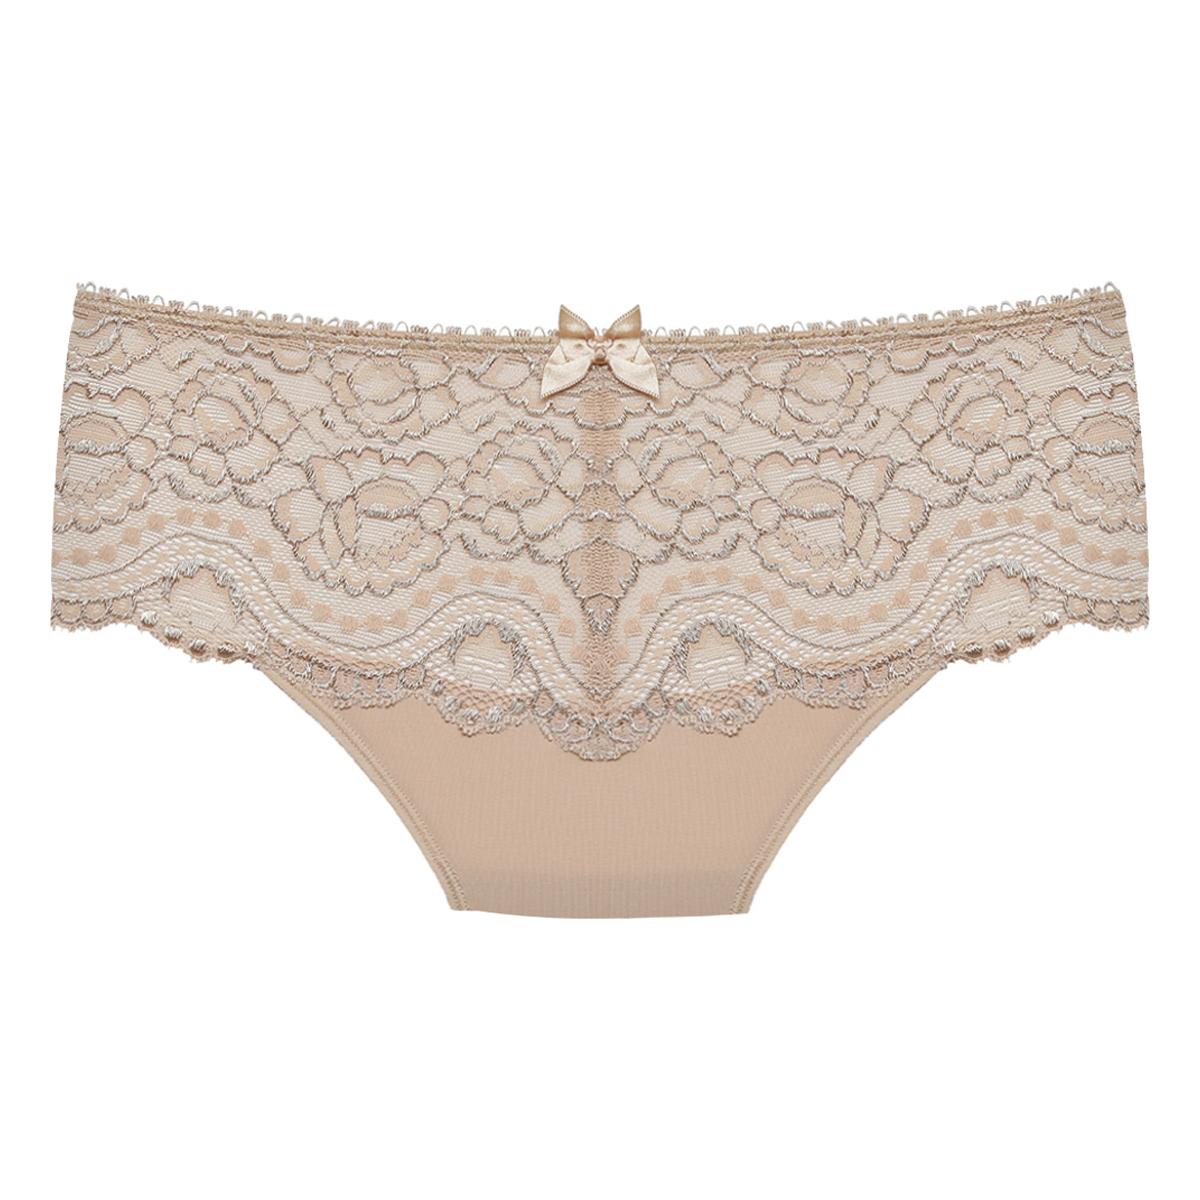 Braga midi beige - Flower Elegance, , PLAYTEX